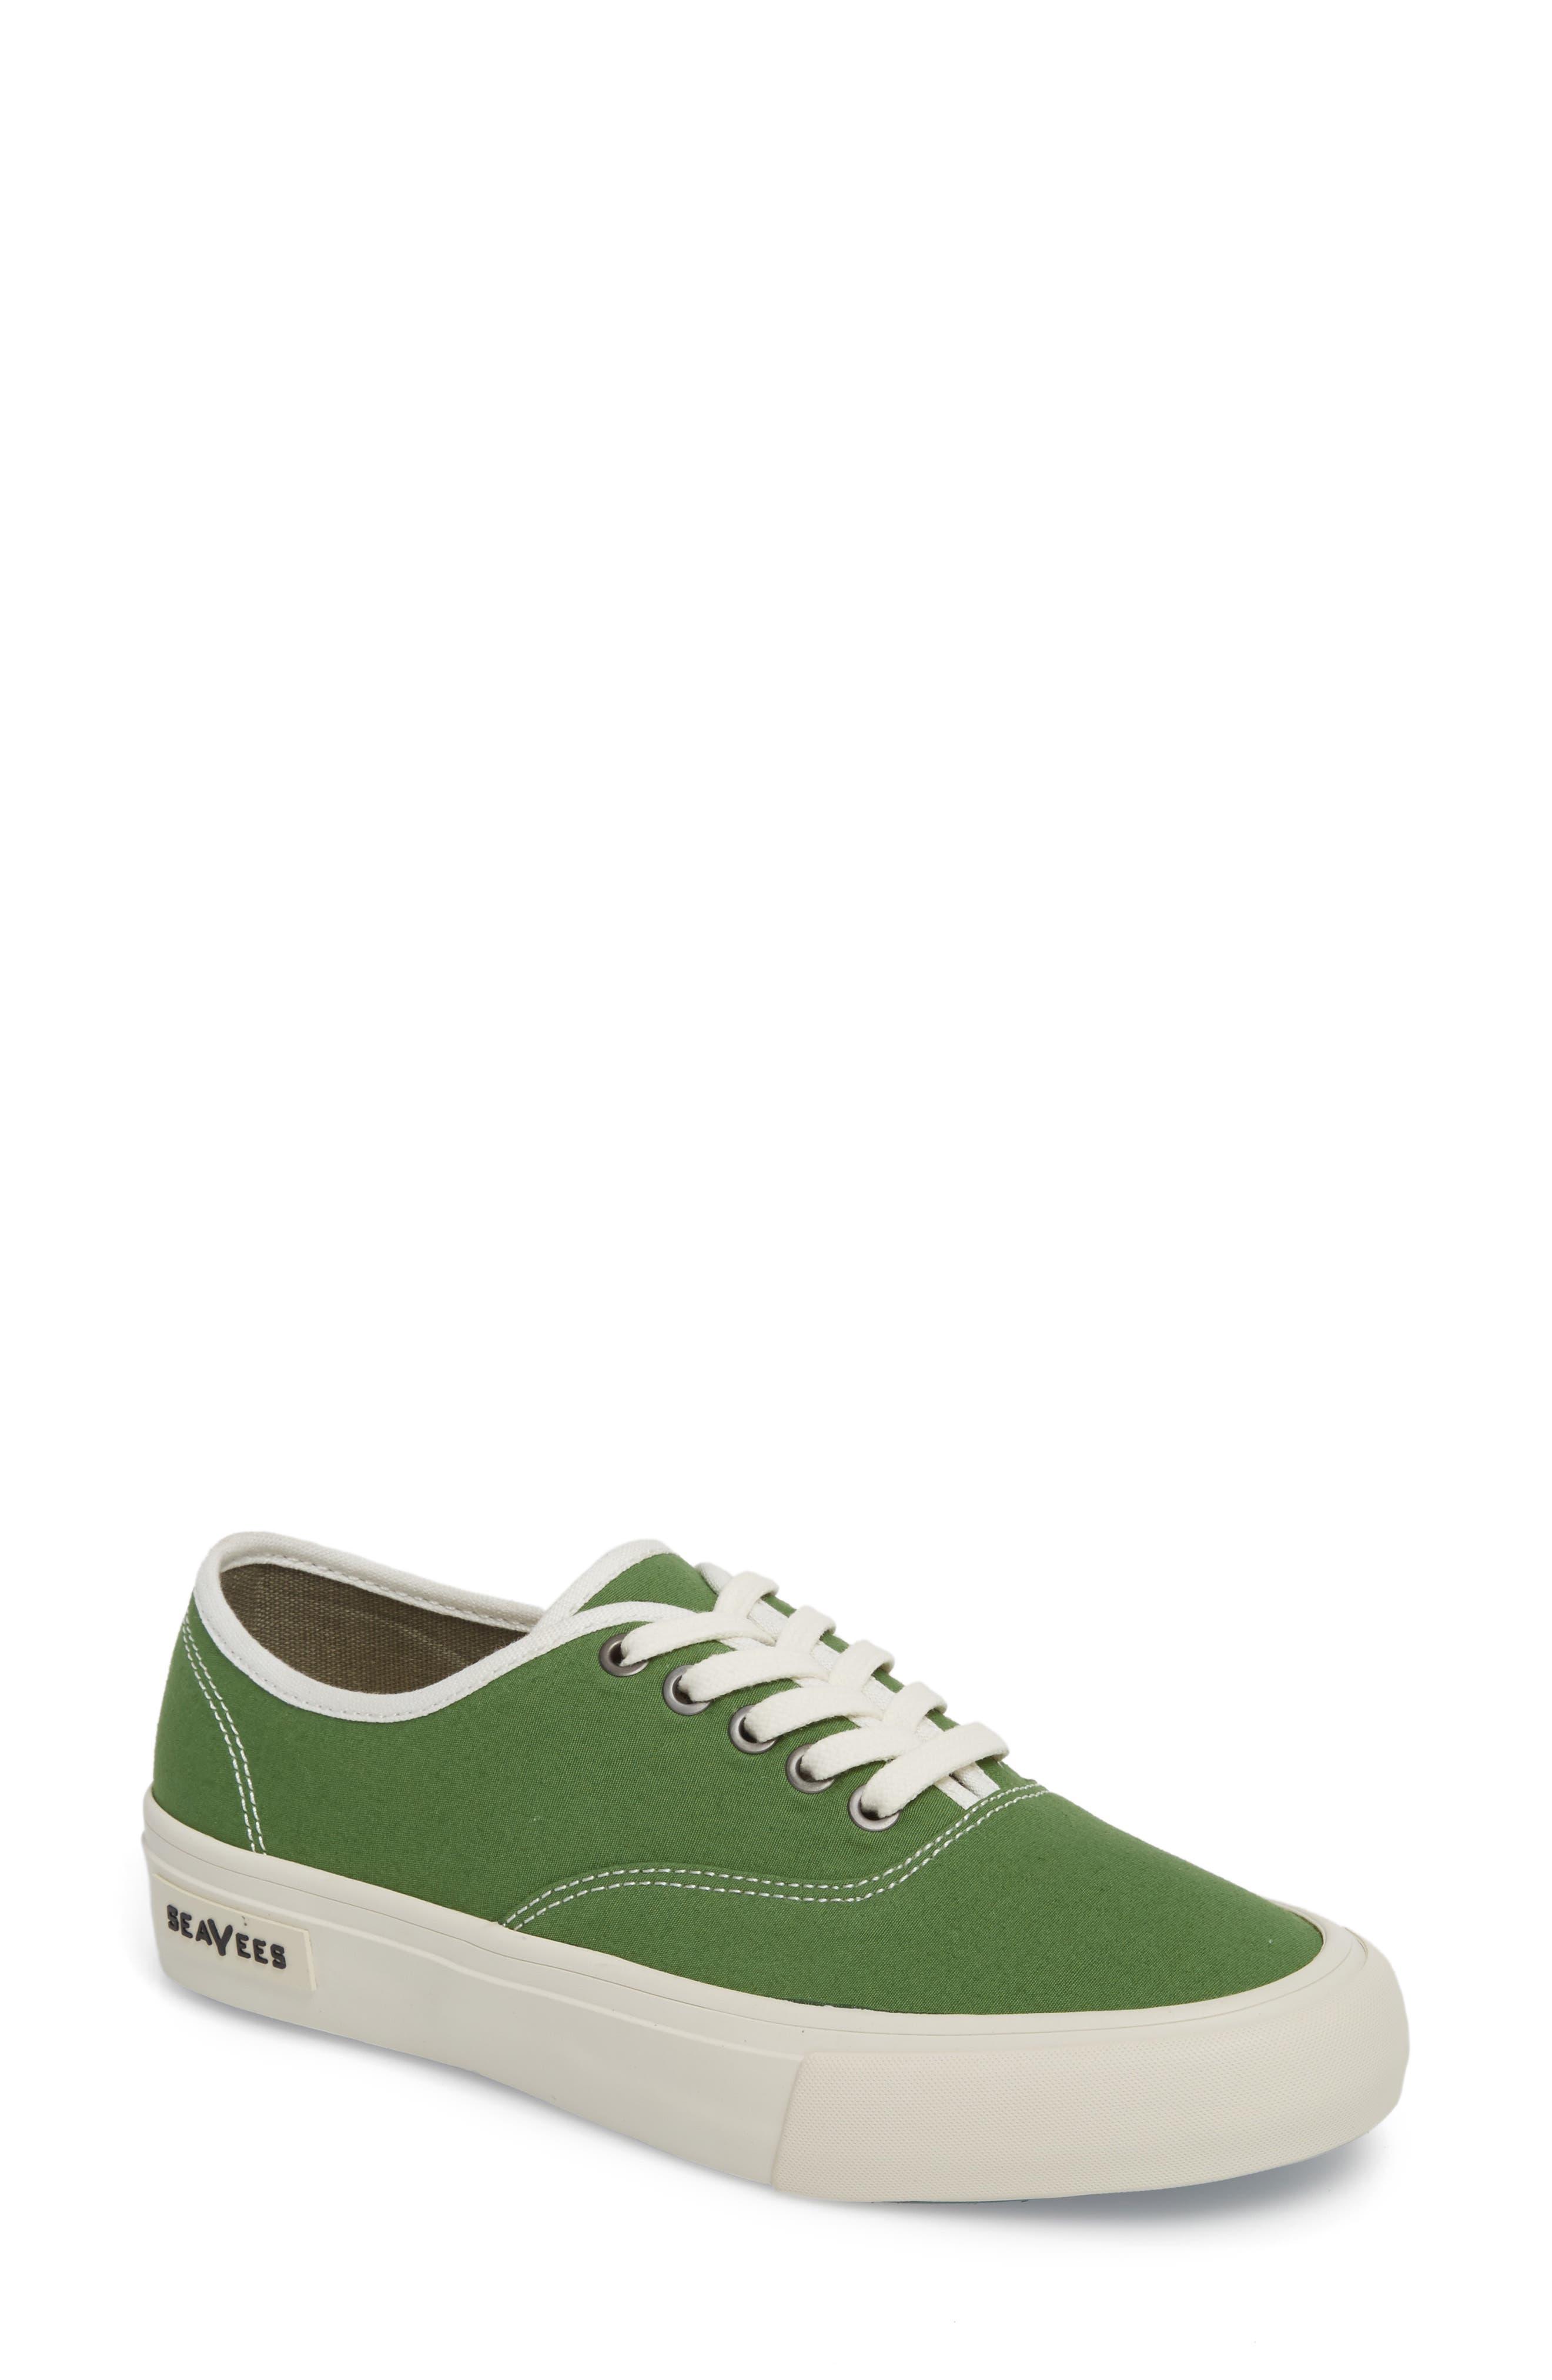 SEAVEES Legend Standard Sneaker, Main, color, CACTUS